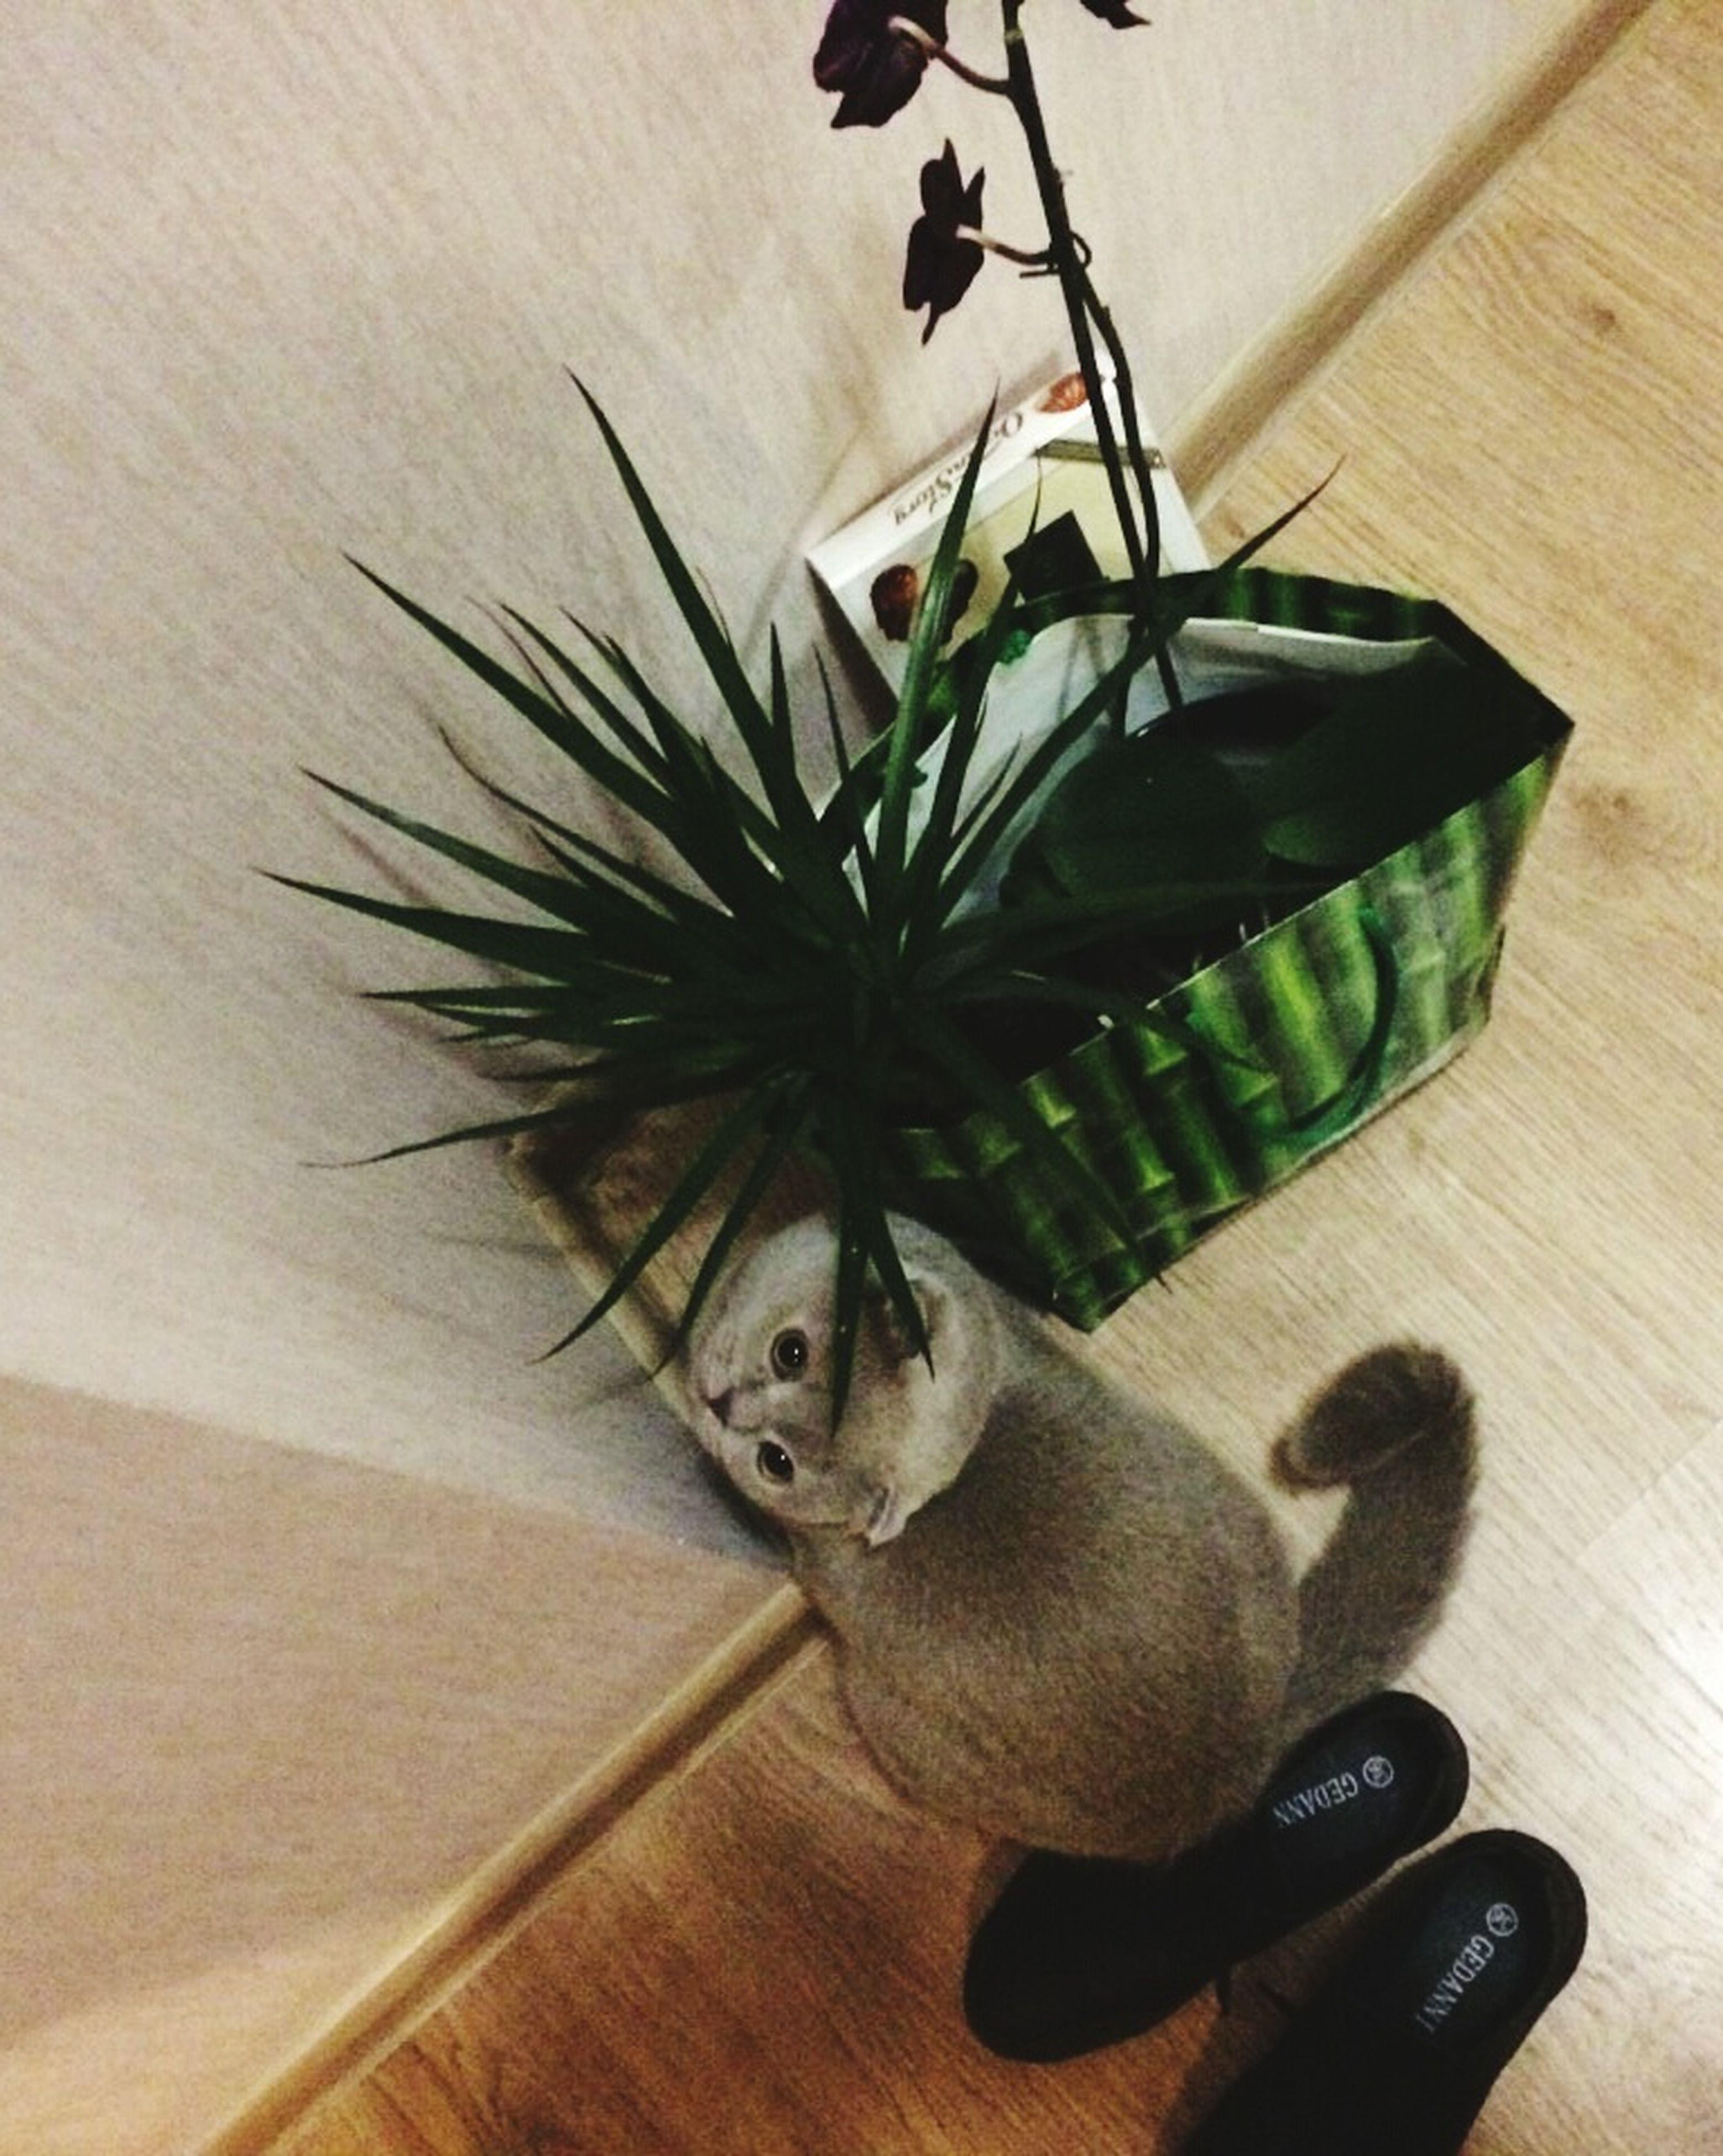 indoors, close-up, flower, growth, freshness, plant, hardwood floor, fragility, flower arrangement, green color